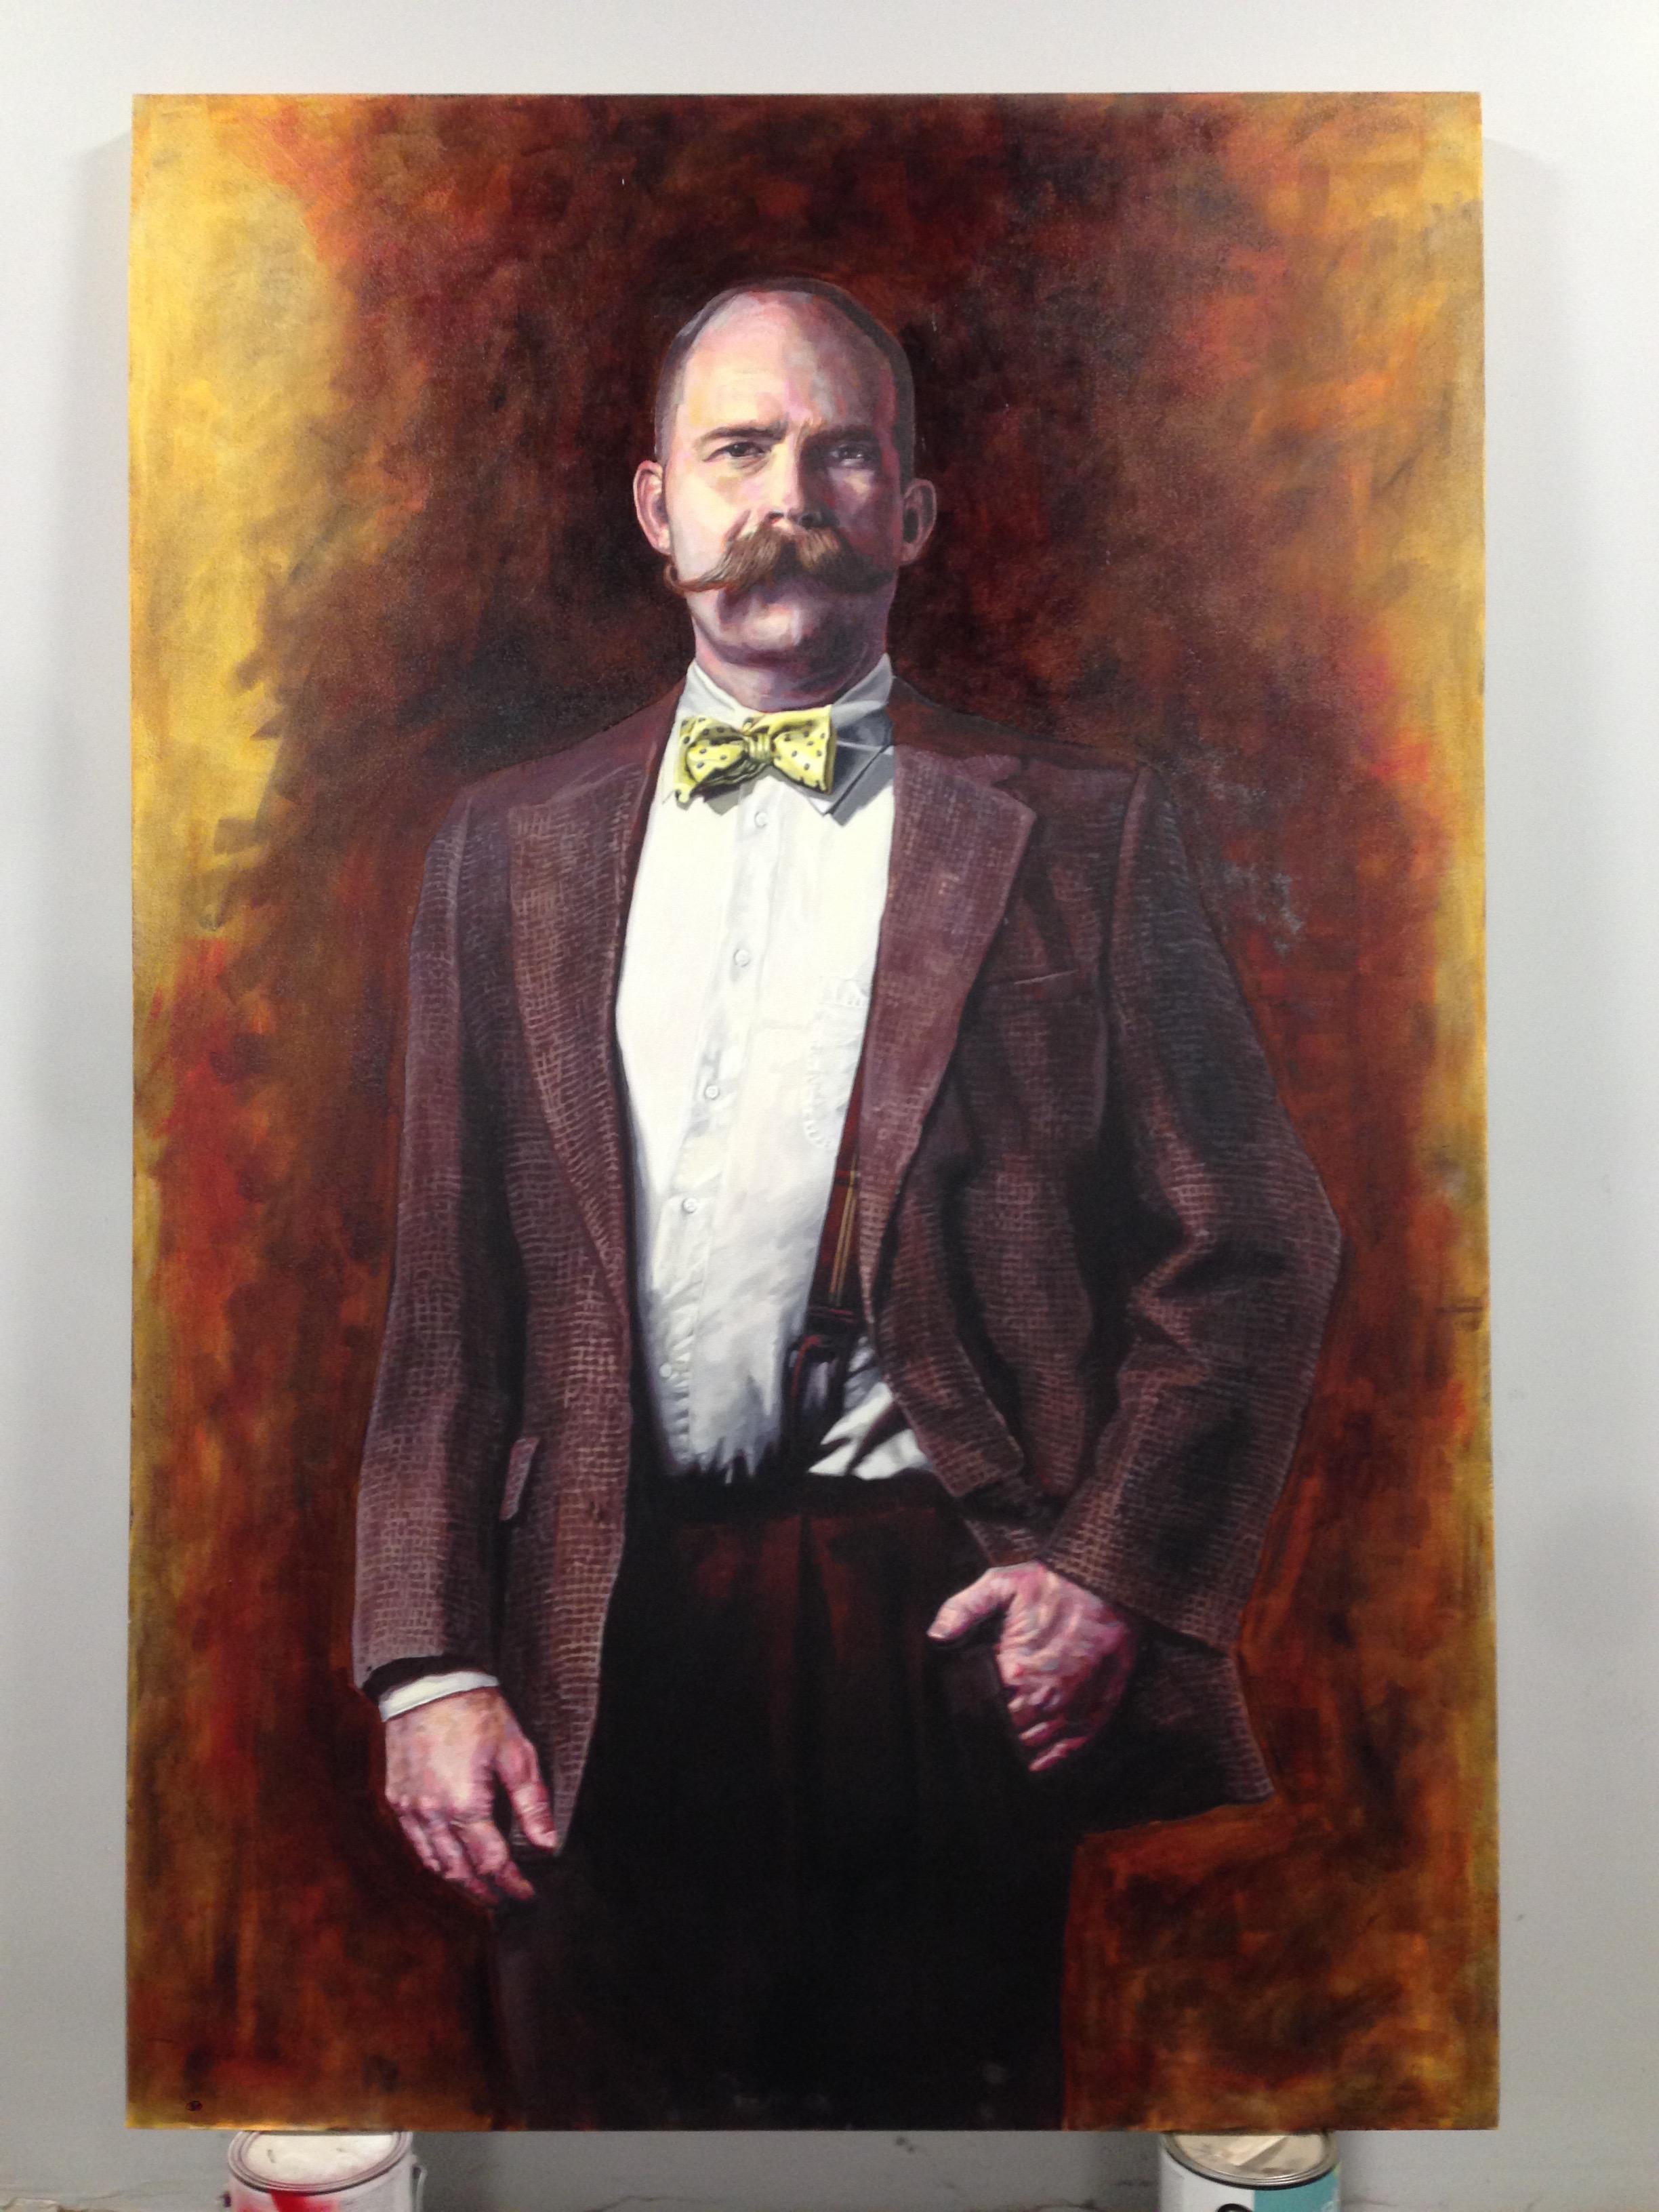 "Frank Duveneck | oil on canvas | 72"" x 60"" | commission for Commonwealth Bistro | Covington, Ky"